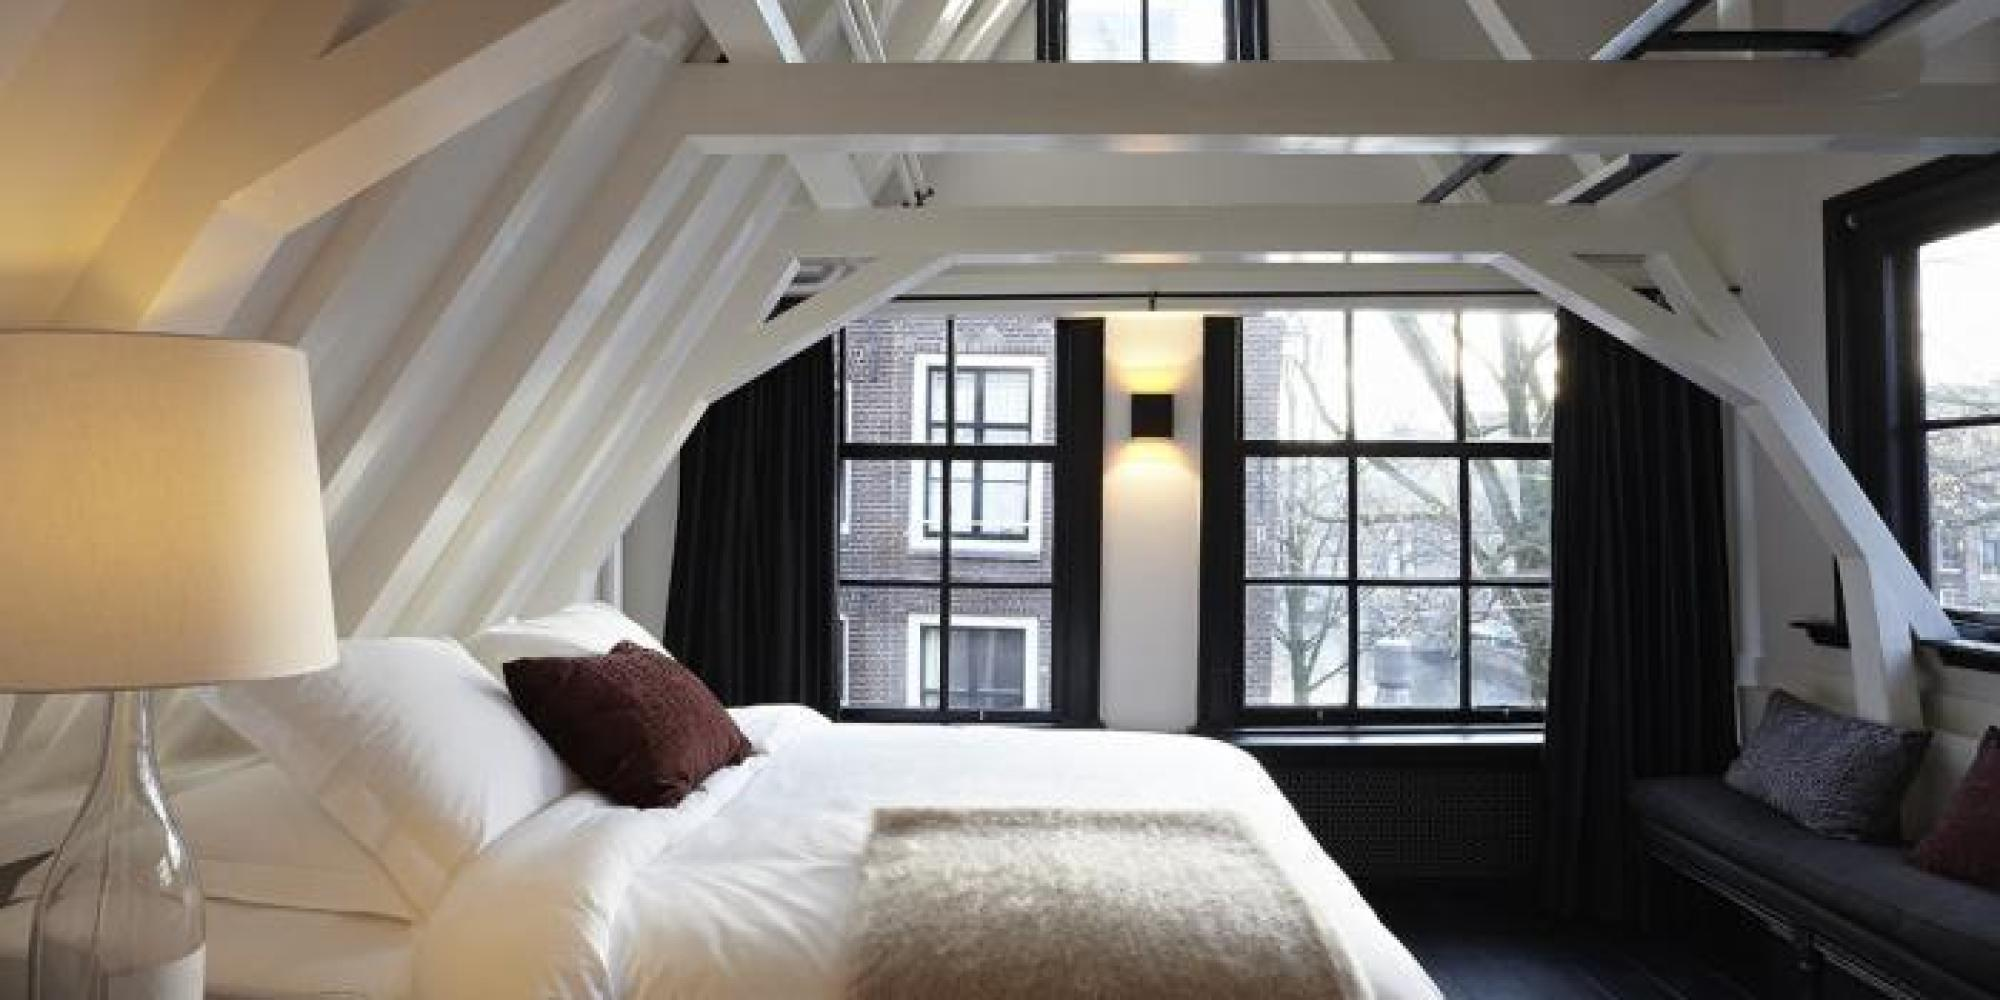 Attic Lofts 10 attic loft bedrooms that'll make you rethink this neglected